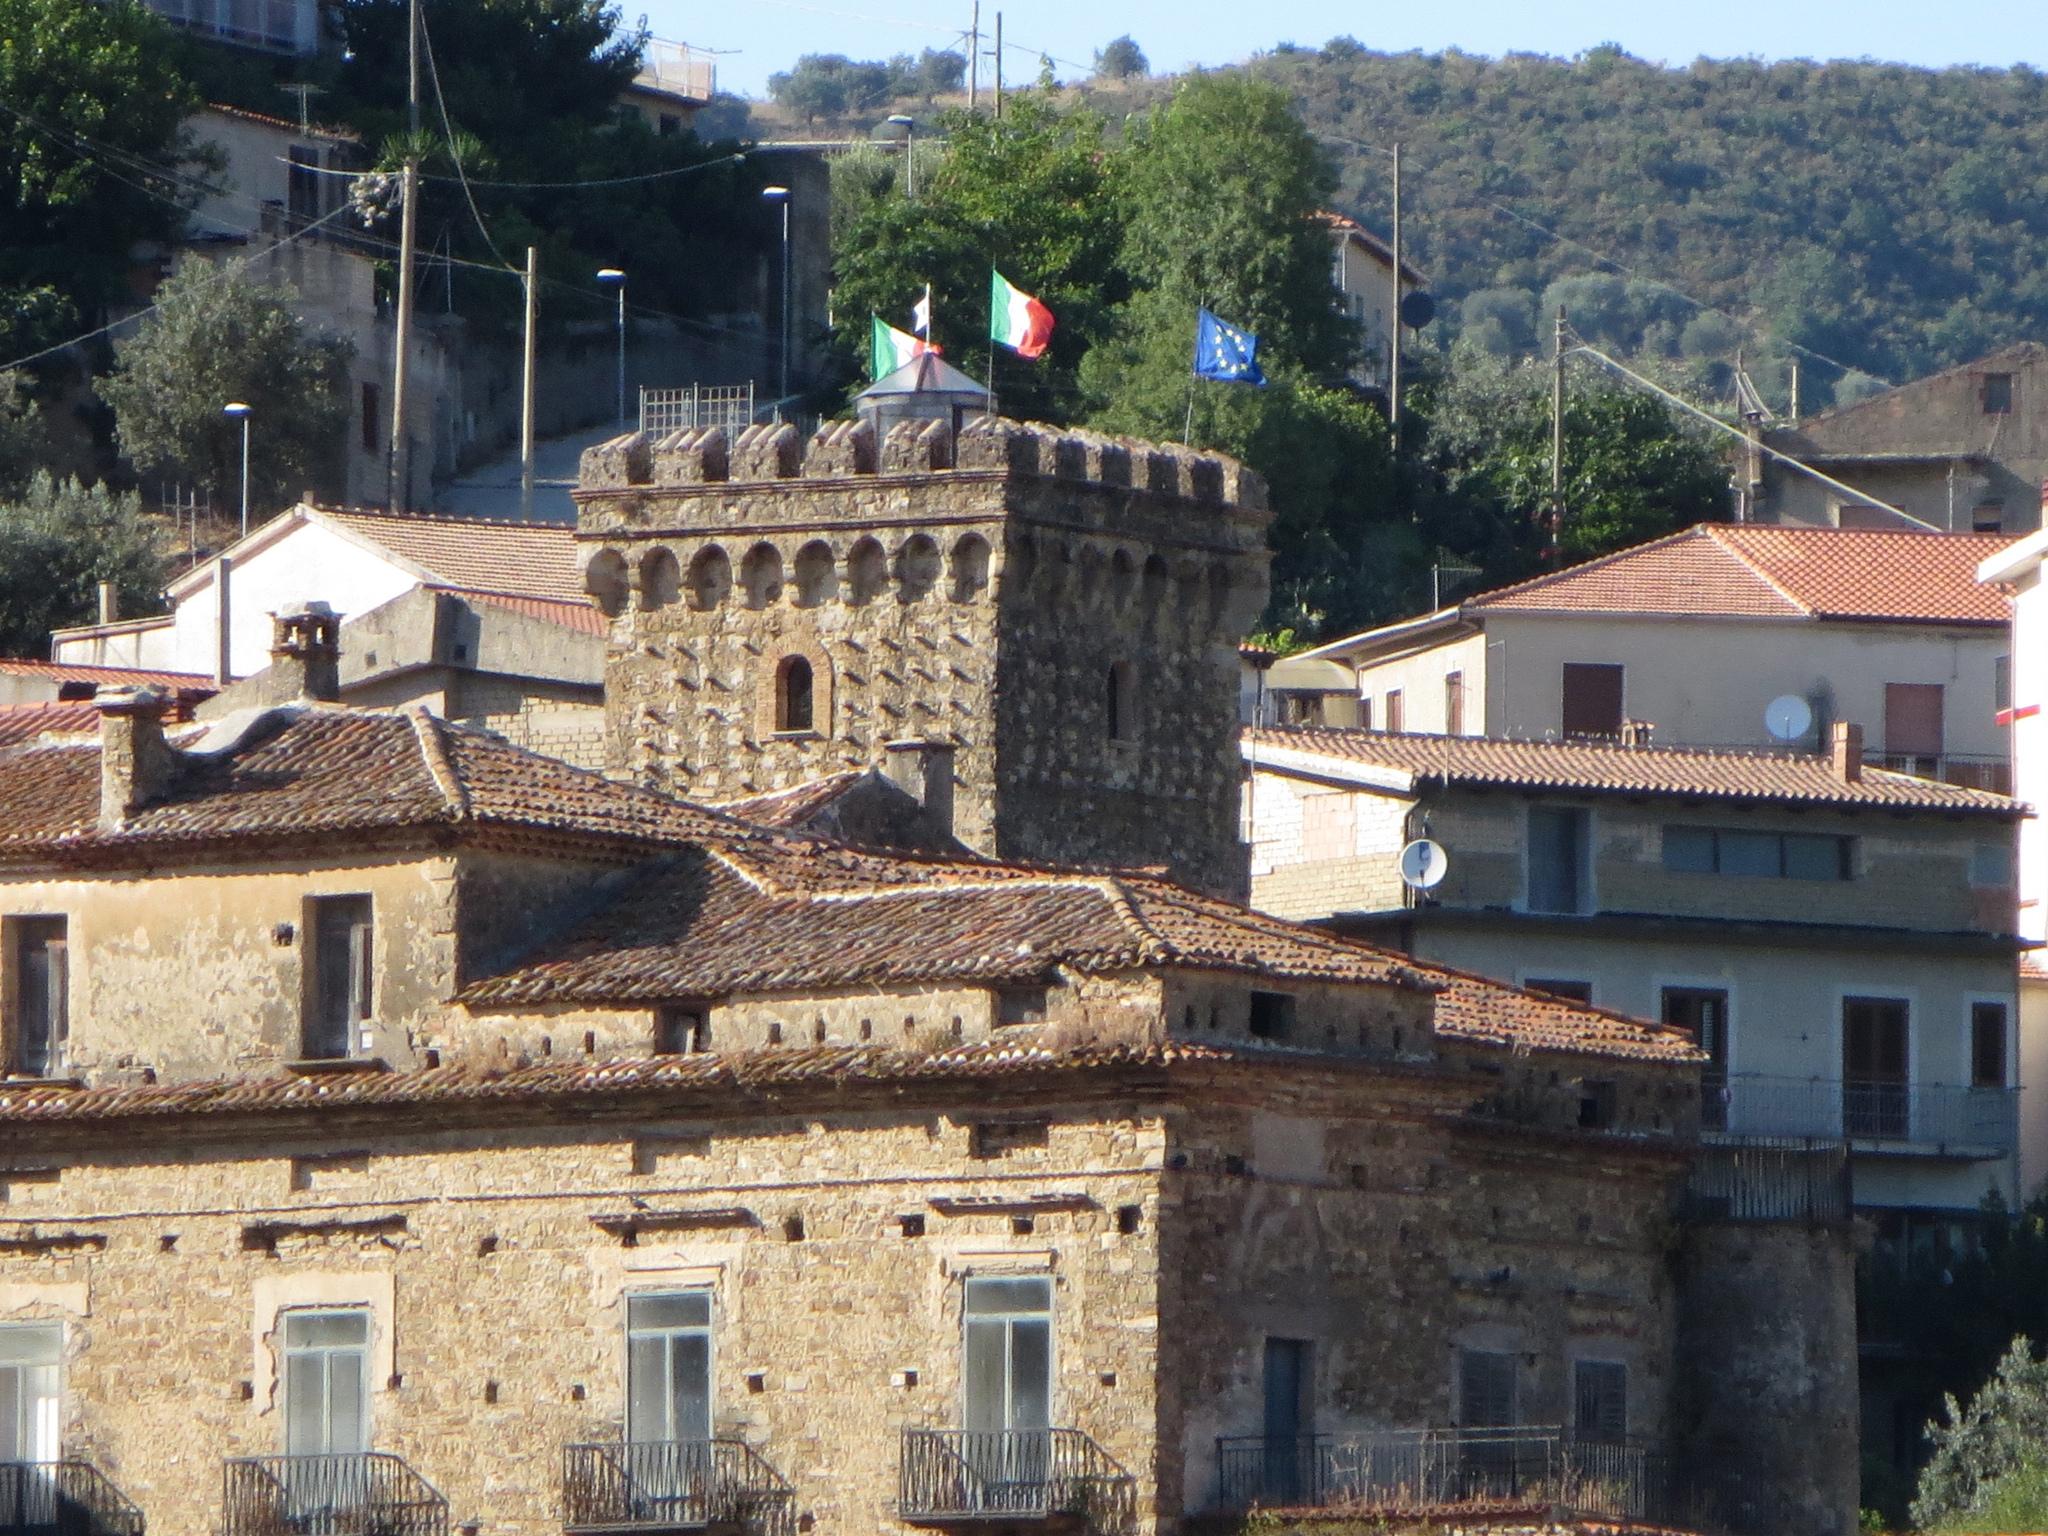 Torre Medievale di Montecorice